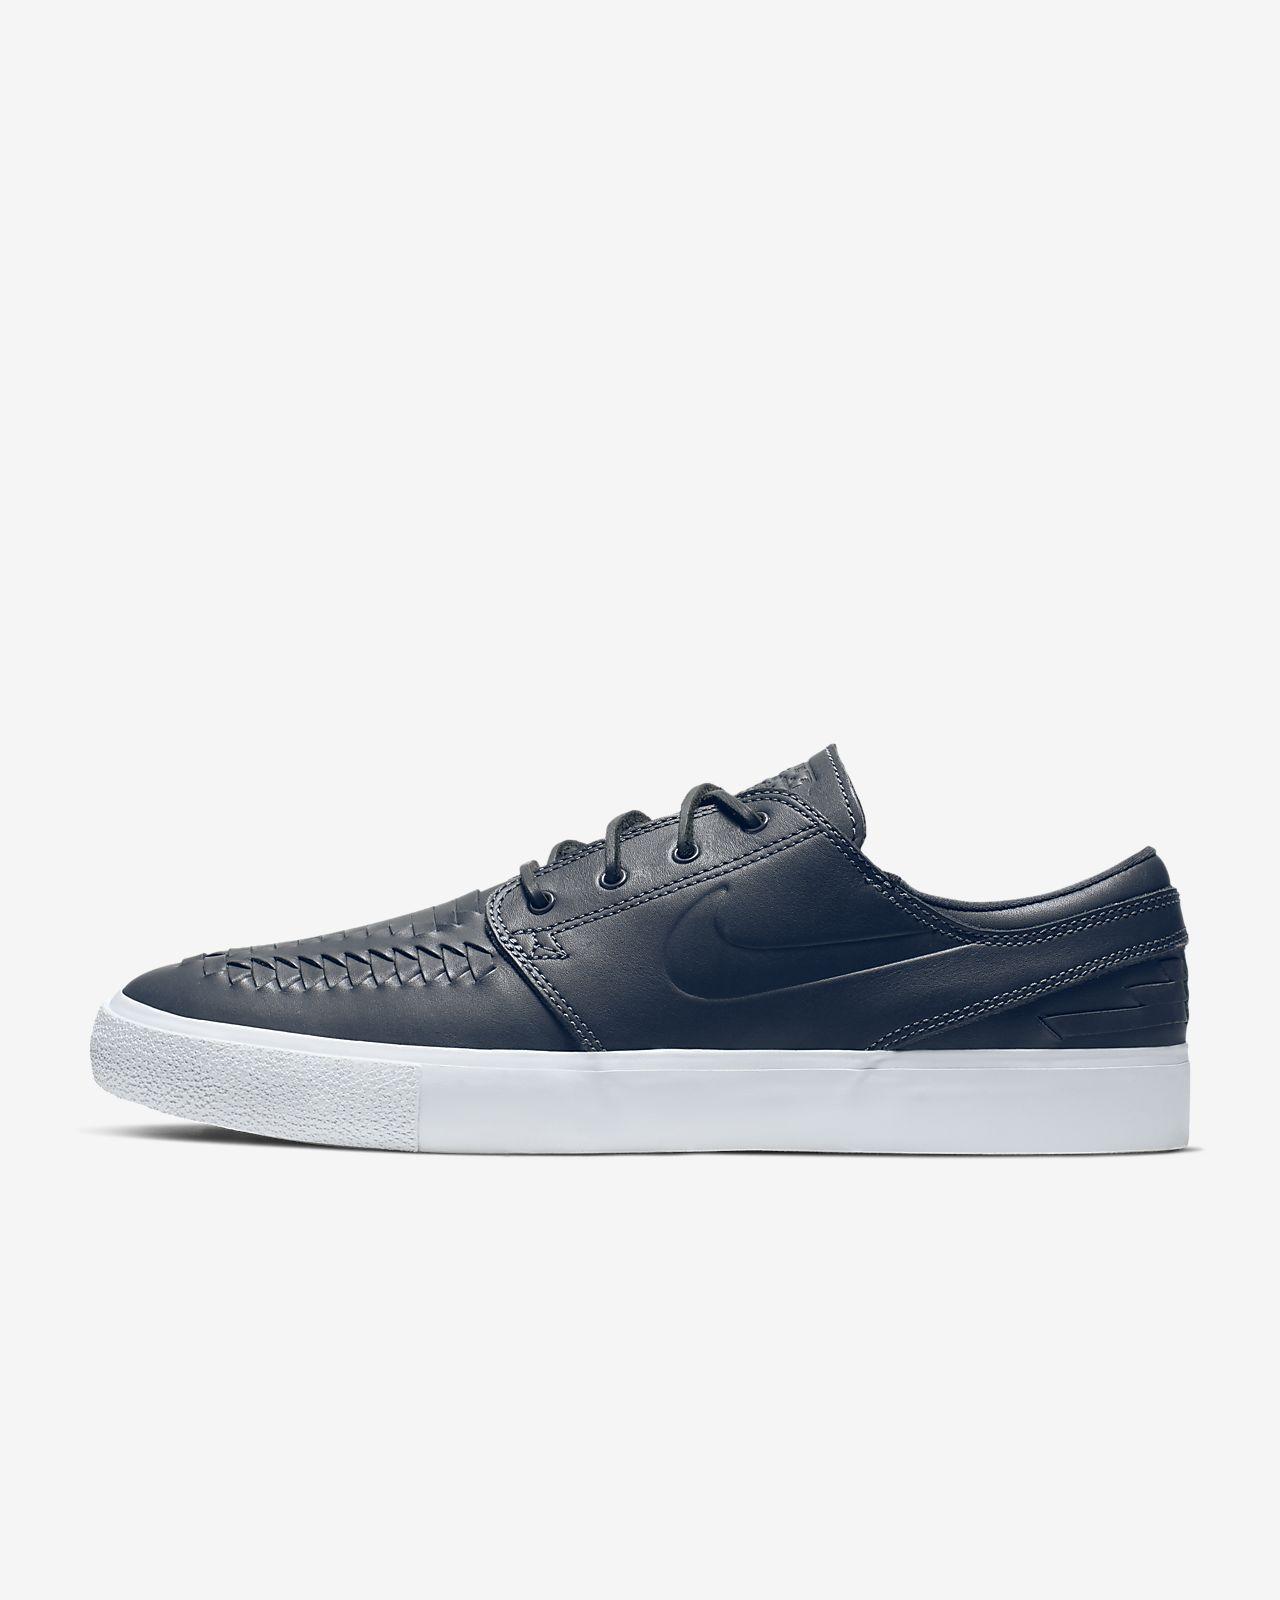 Calzado de skateboarding Nike SB Zoom Stefan Janoski RM Crafted